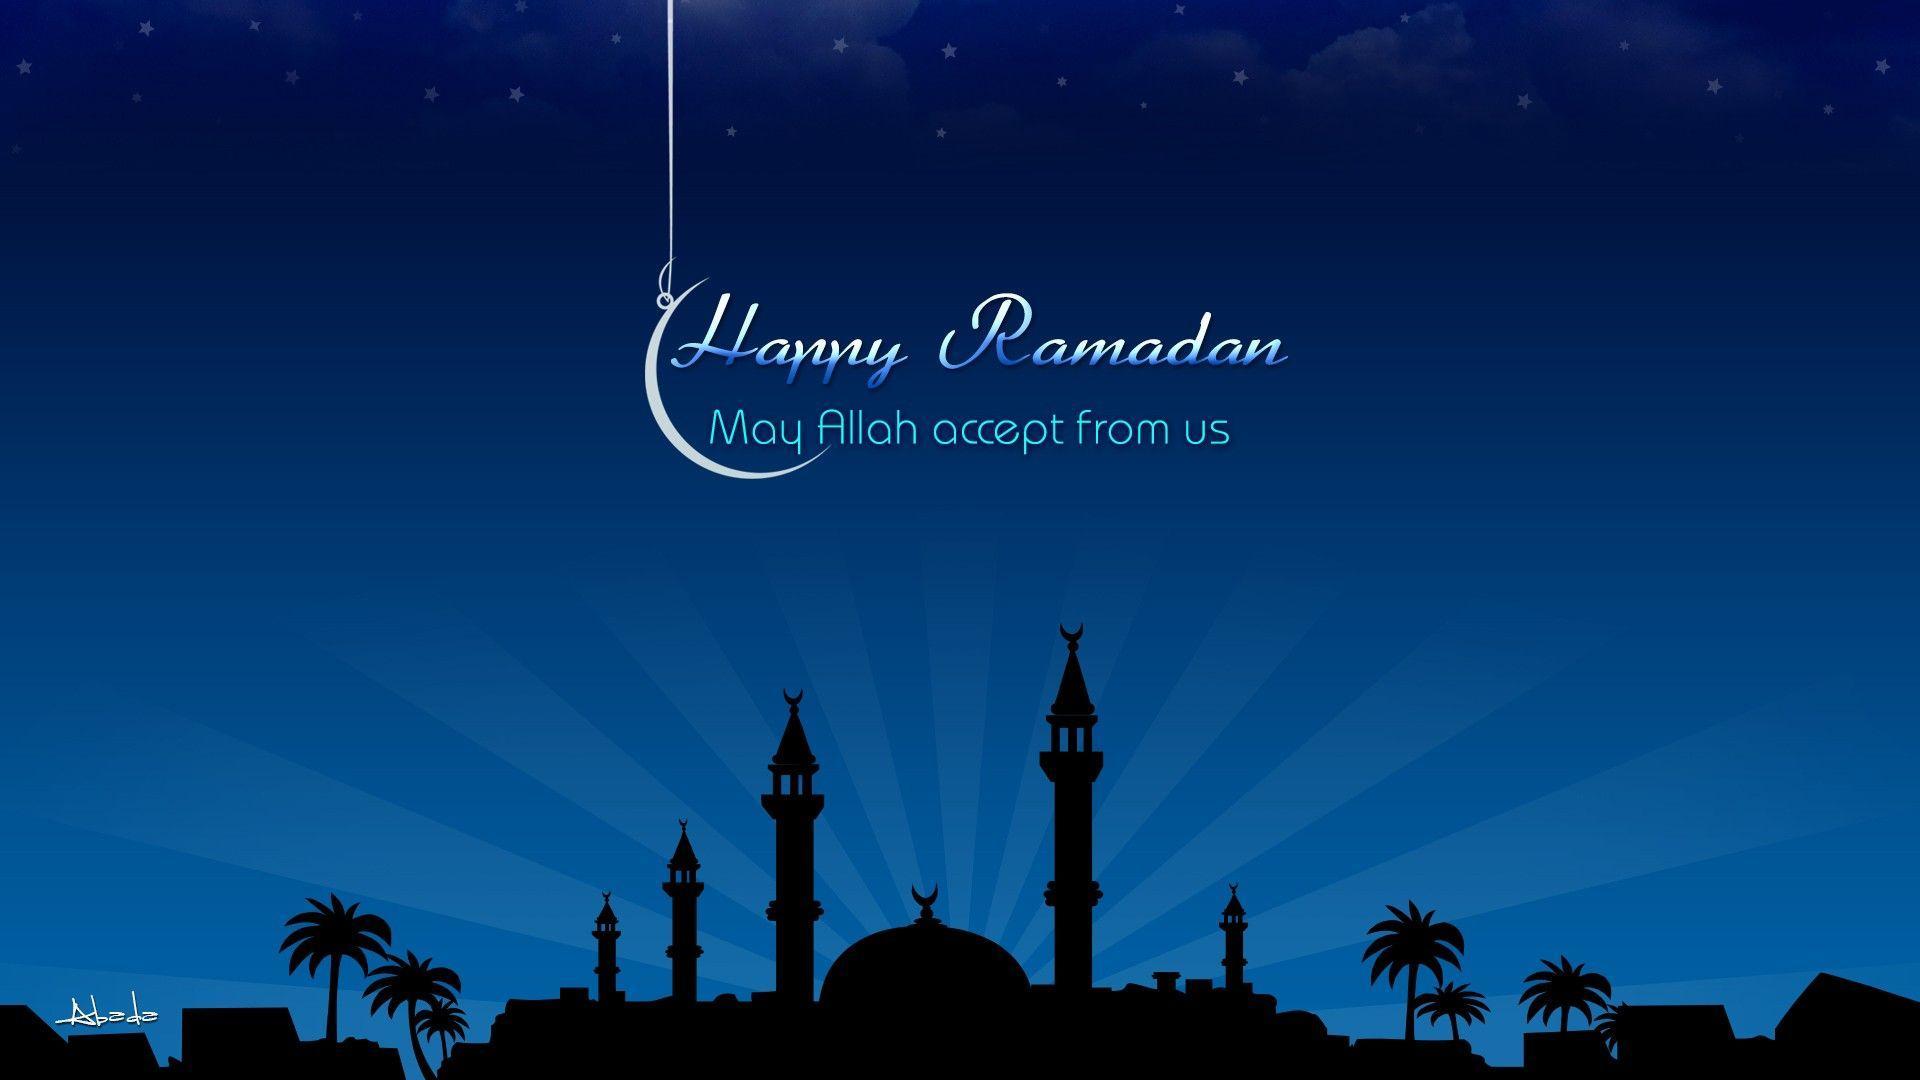 Ramadan Wallpapers Archives - Islami Wallpapers